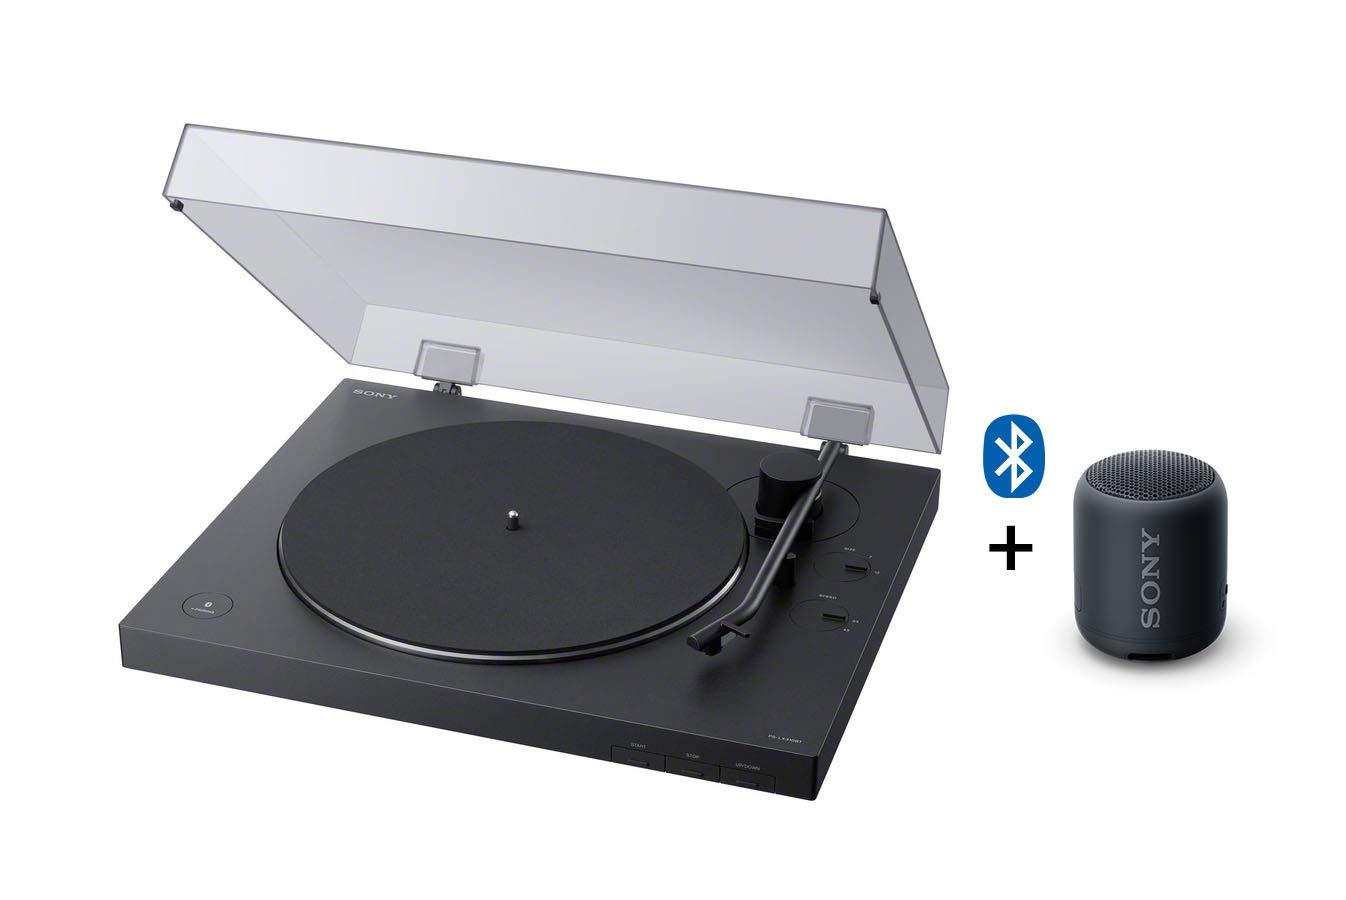 comparatif platine vinyle tests et avis platine vinyle 2019